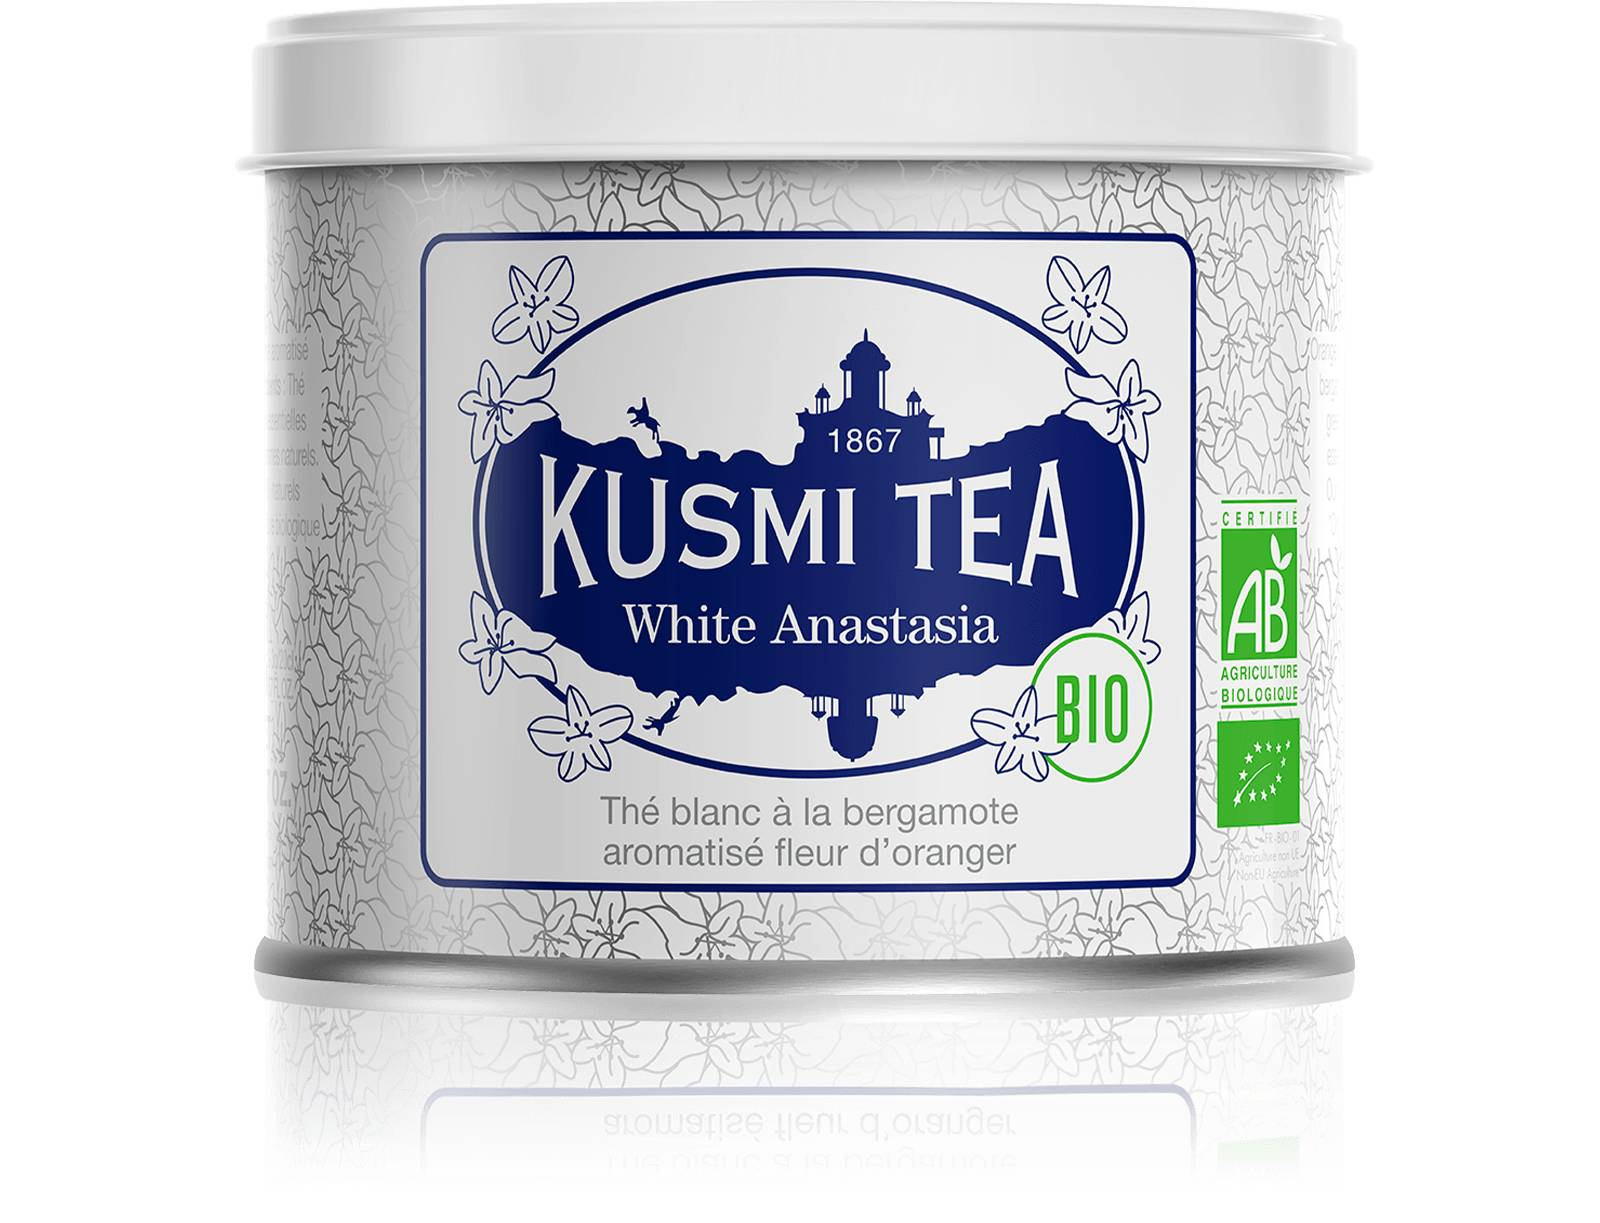 KUSMI TEA White Anastasia bio - Thé blanc, bergamote - Boîte de thé en vrac - Kusmi Tea